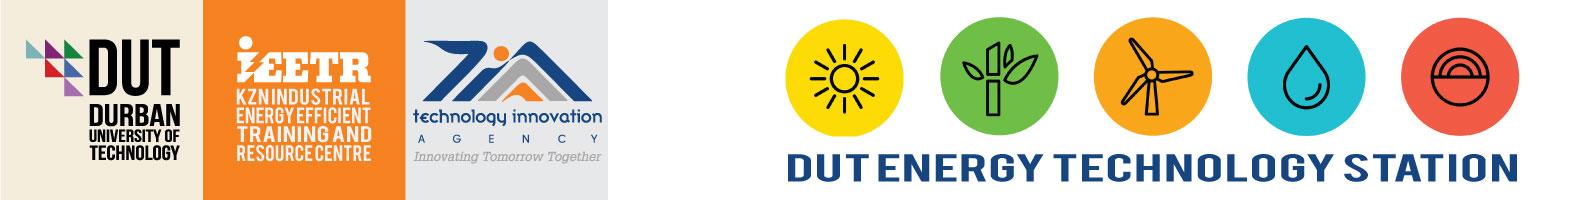 DUT Energy Technology Station